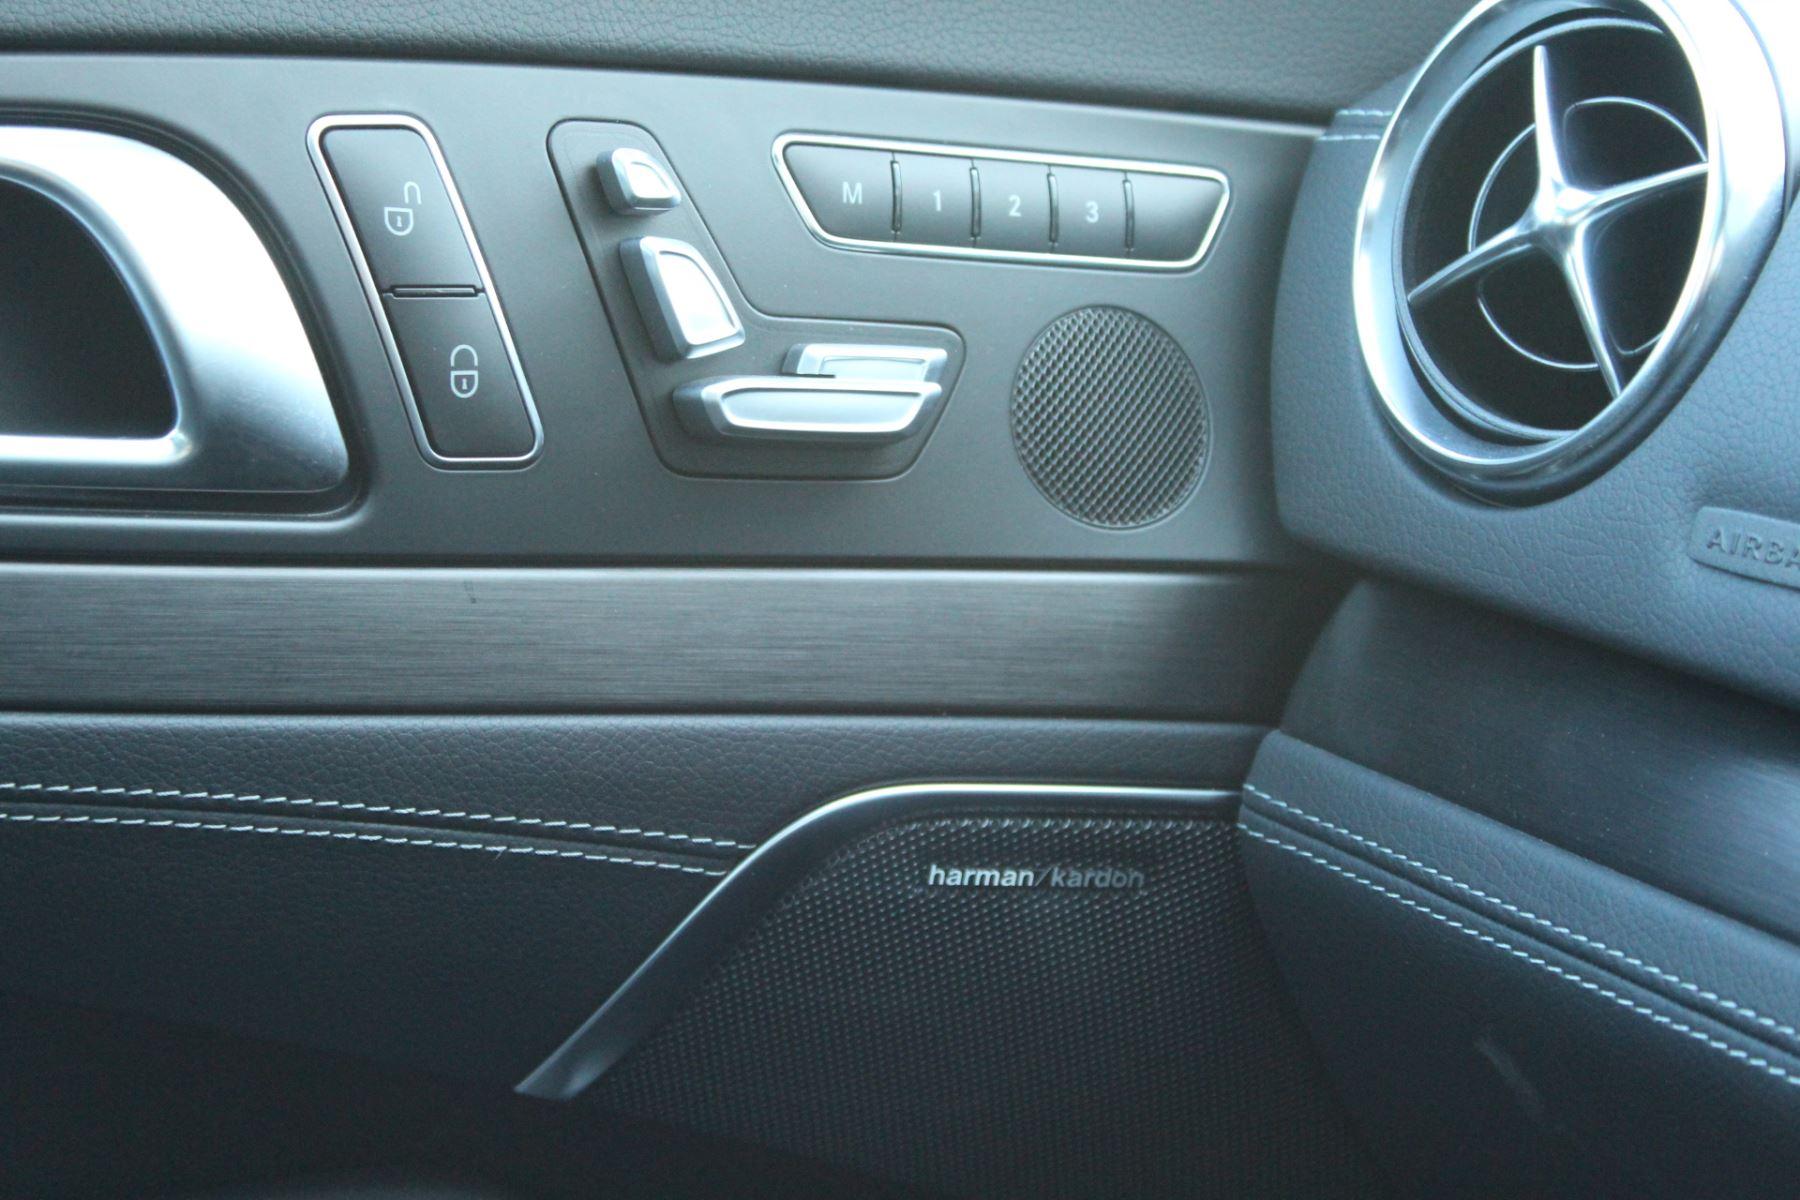 Mercedes-Benz SL SL 400 AMG Line Premium 2dr 9G-Tronic image 12